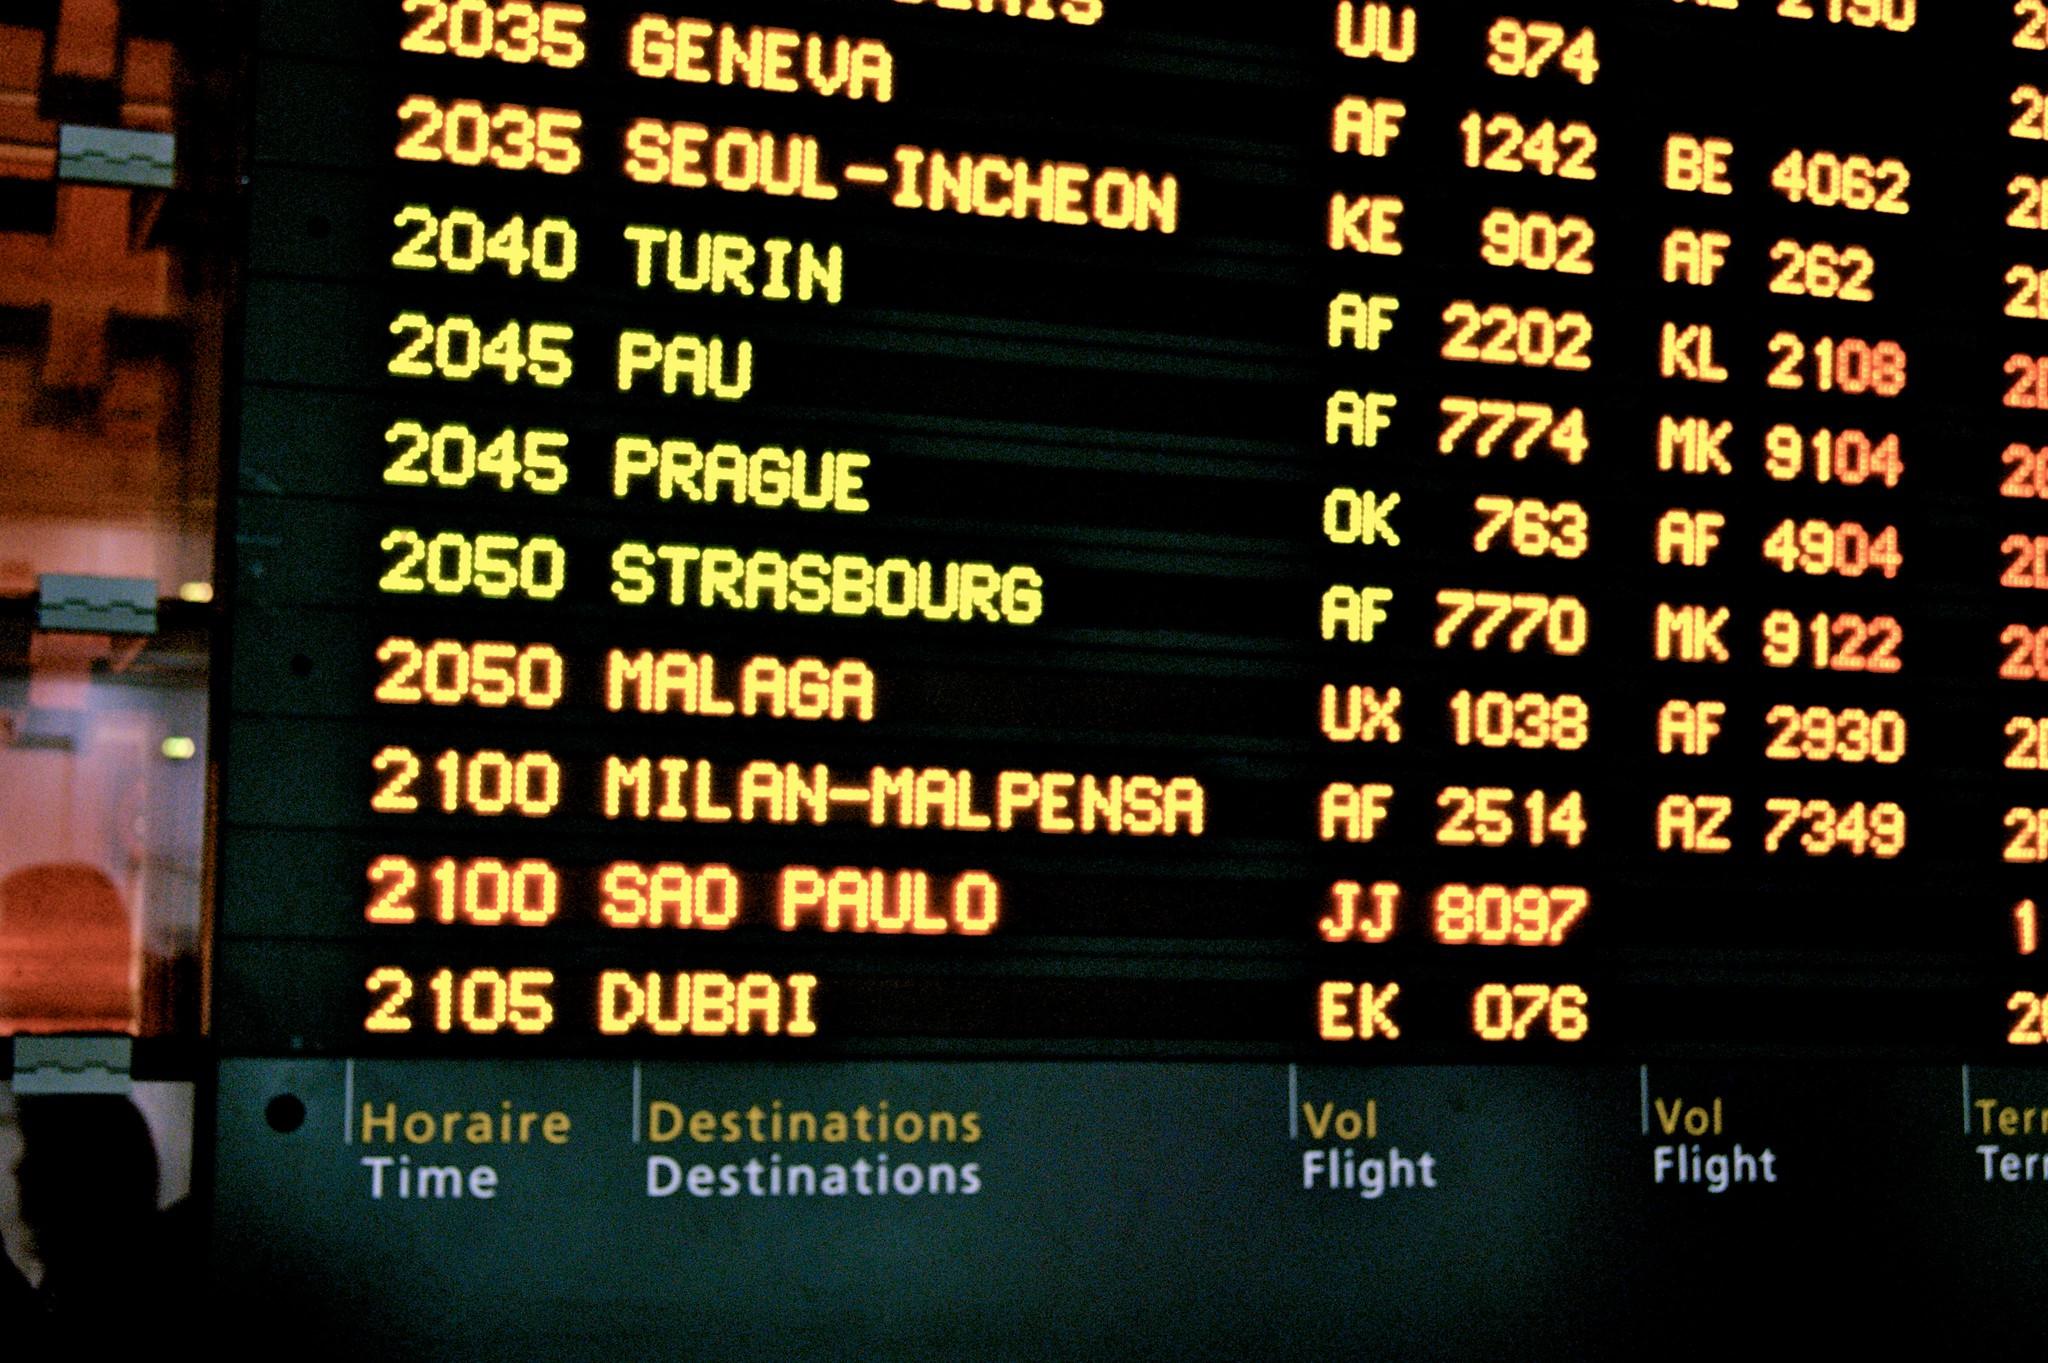 Hi, I'm in Dubaï